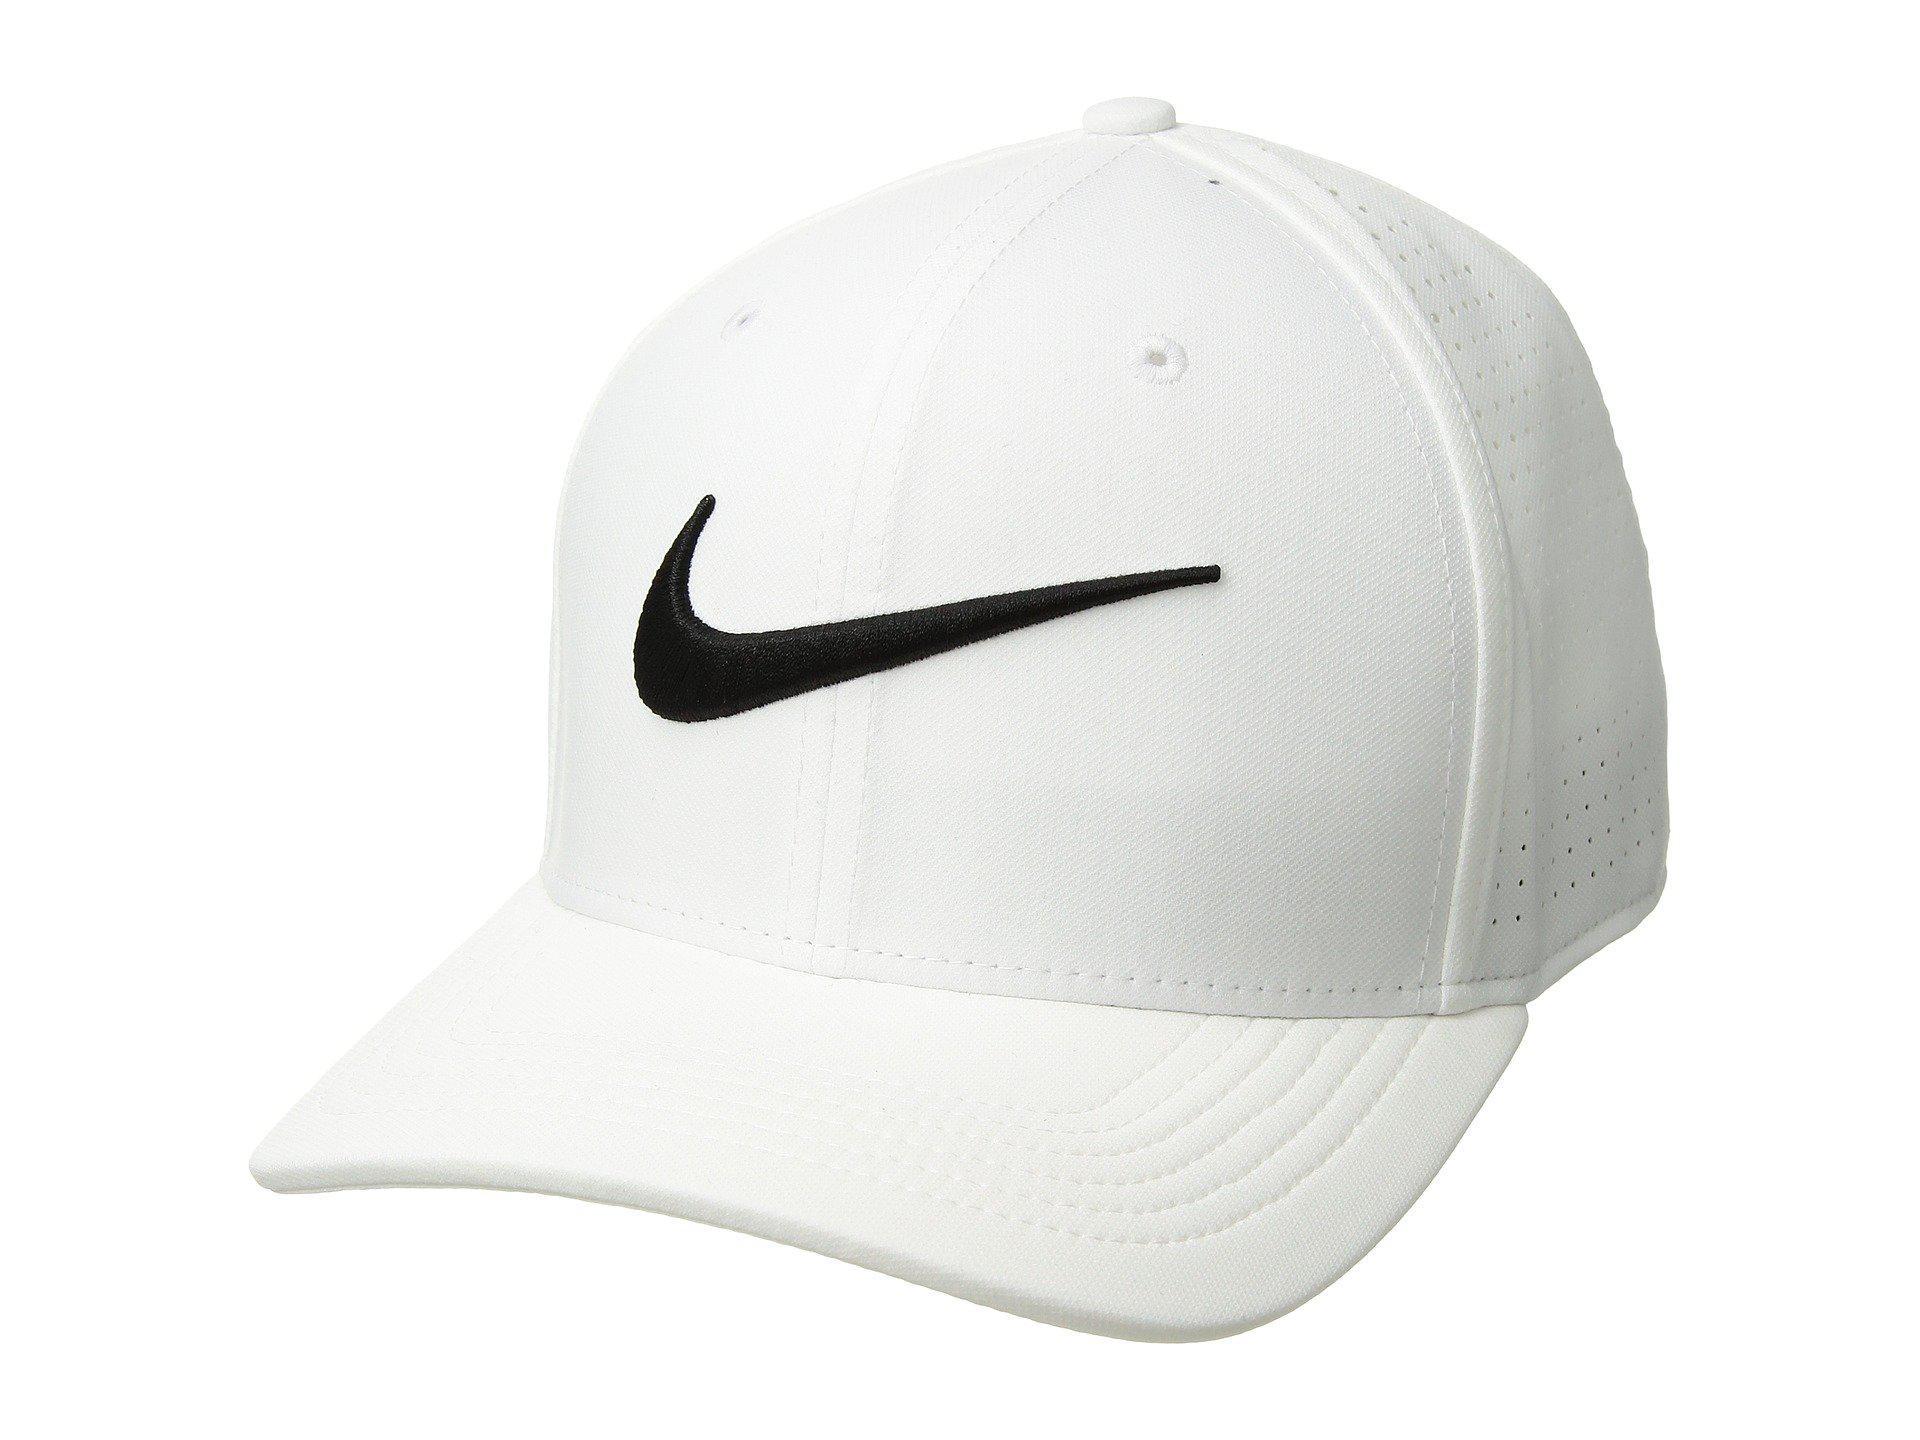 2765a06cbc6 Lyst - Nike Train Vapor Swooshflex Hat in White for Men - Save 48%